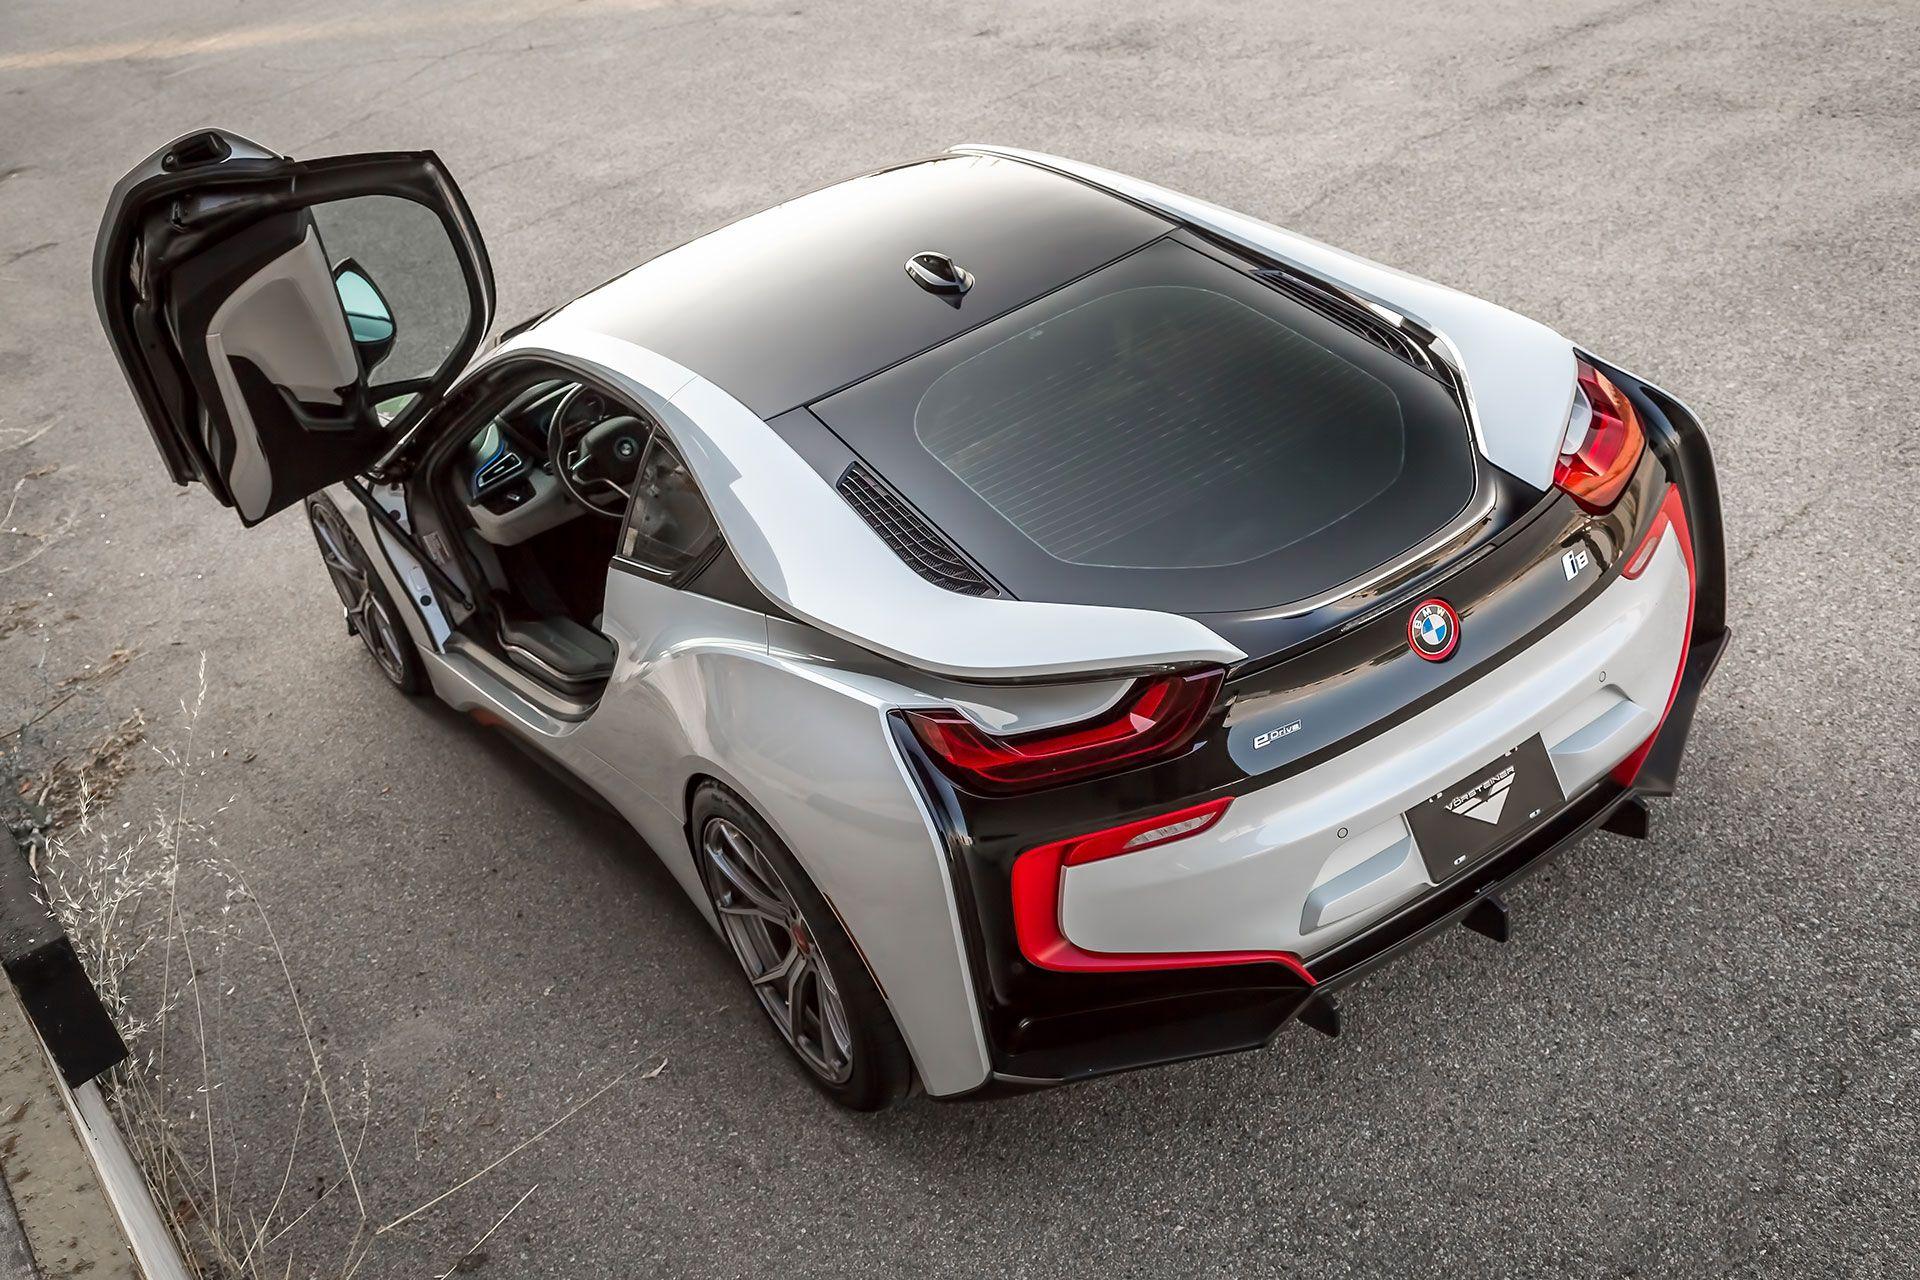 Bmw I8 Body Kits Carbon Fiber Aero Kits Vorsteiner Luxury Cars